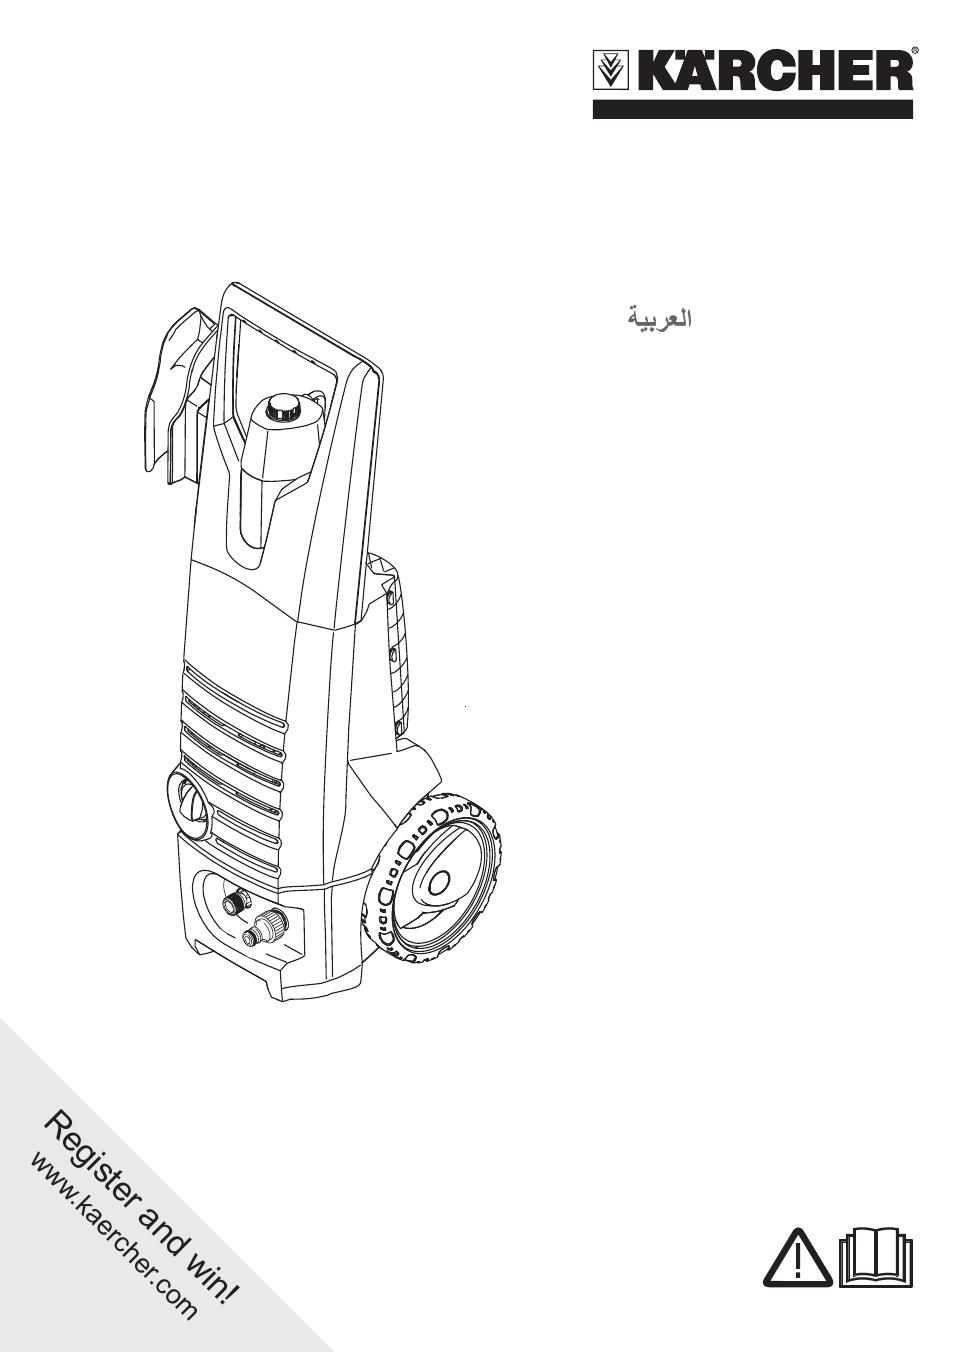 Karcher 570 Mode Demploi